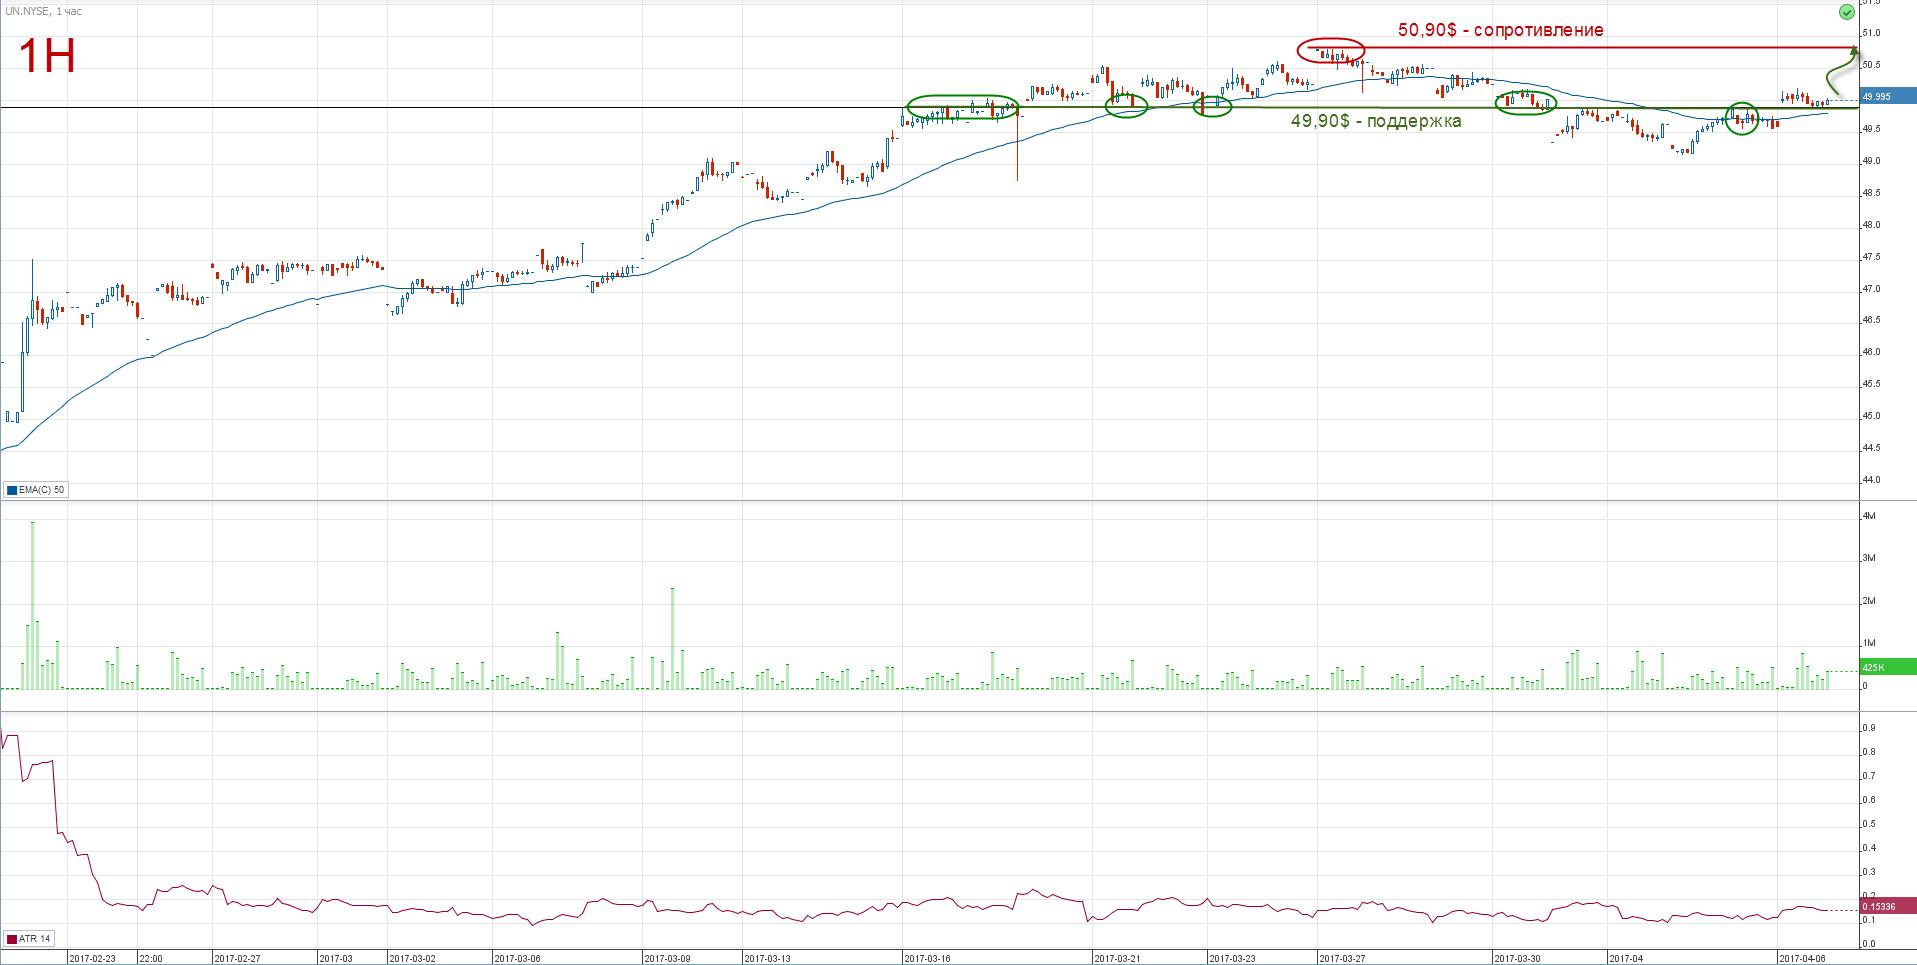 График стоимости акций Unilever